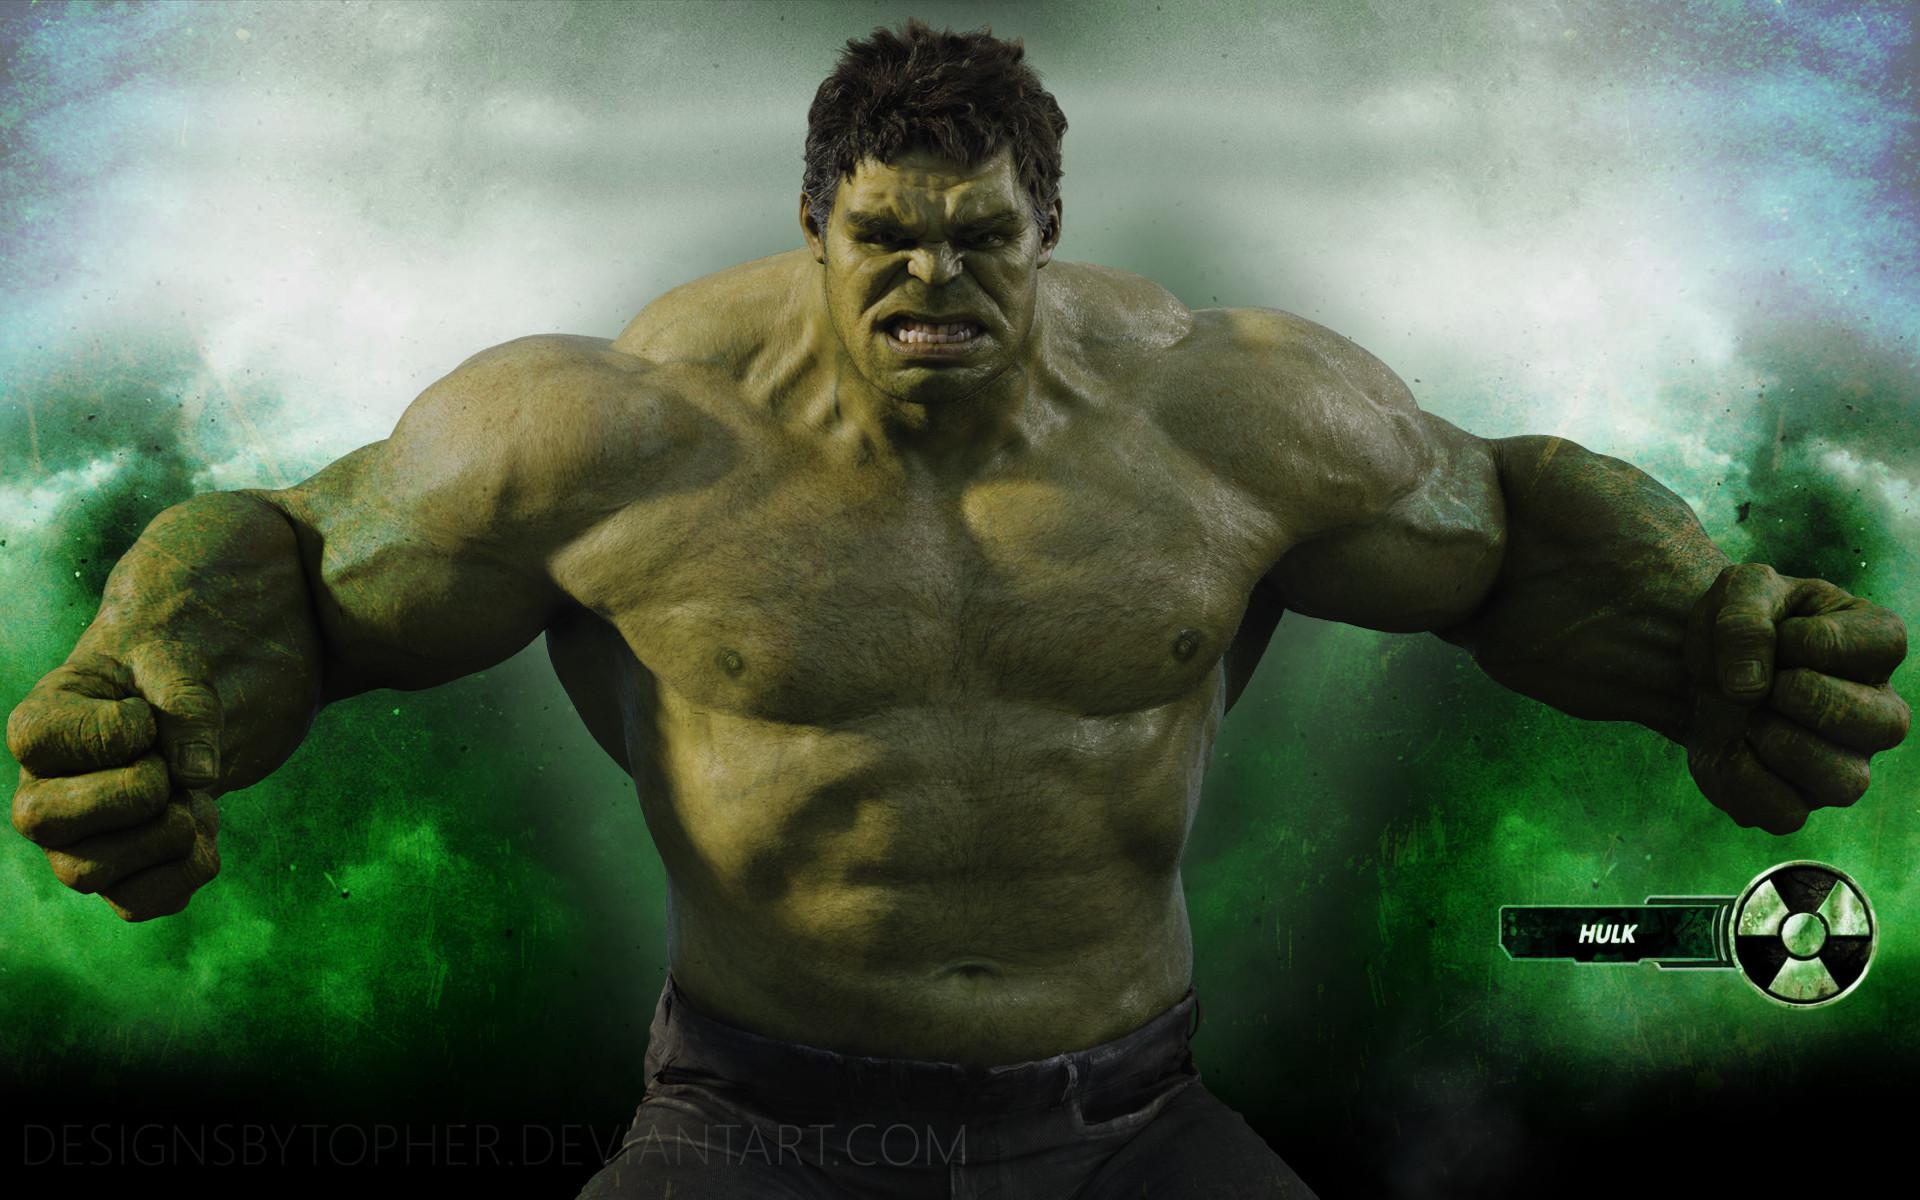 1920x1080 Hulk Wallpaper close up